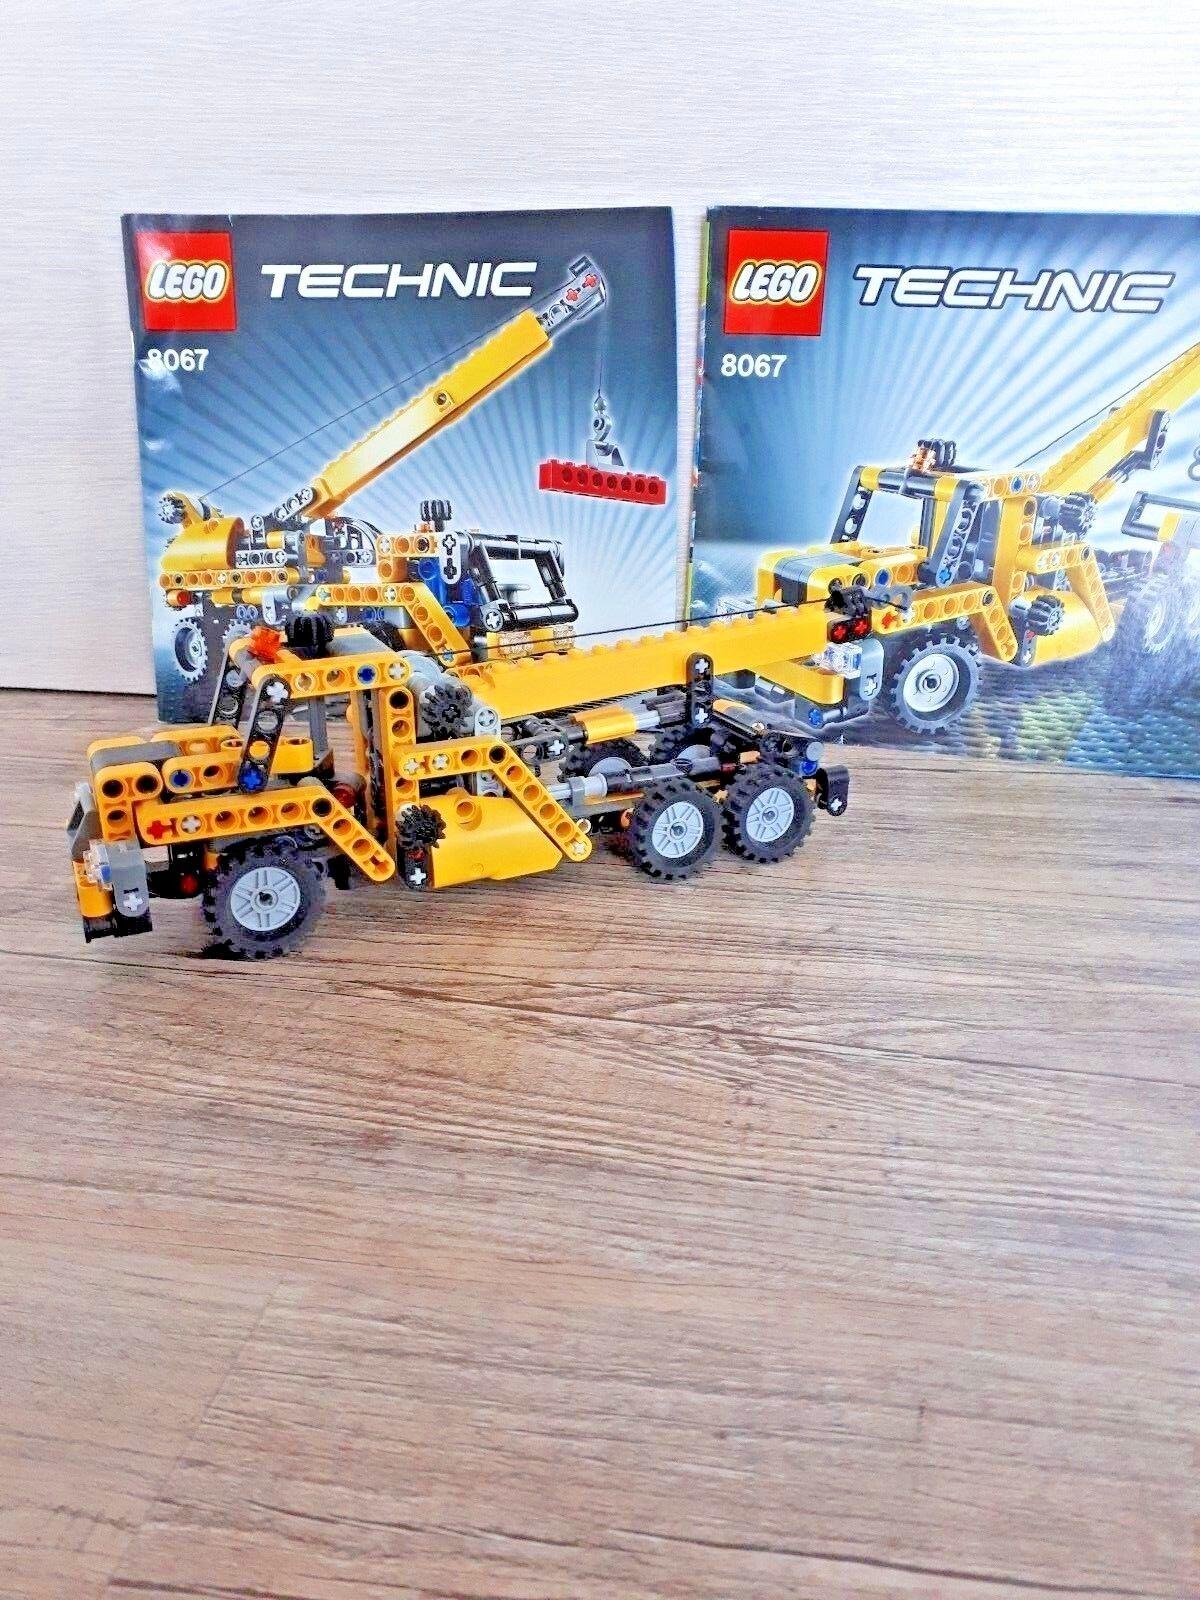 Lego Technic Kranwagen 2in1 8067